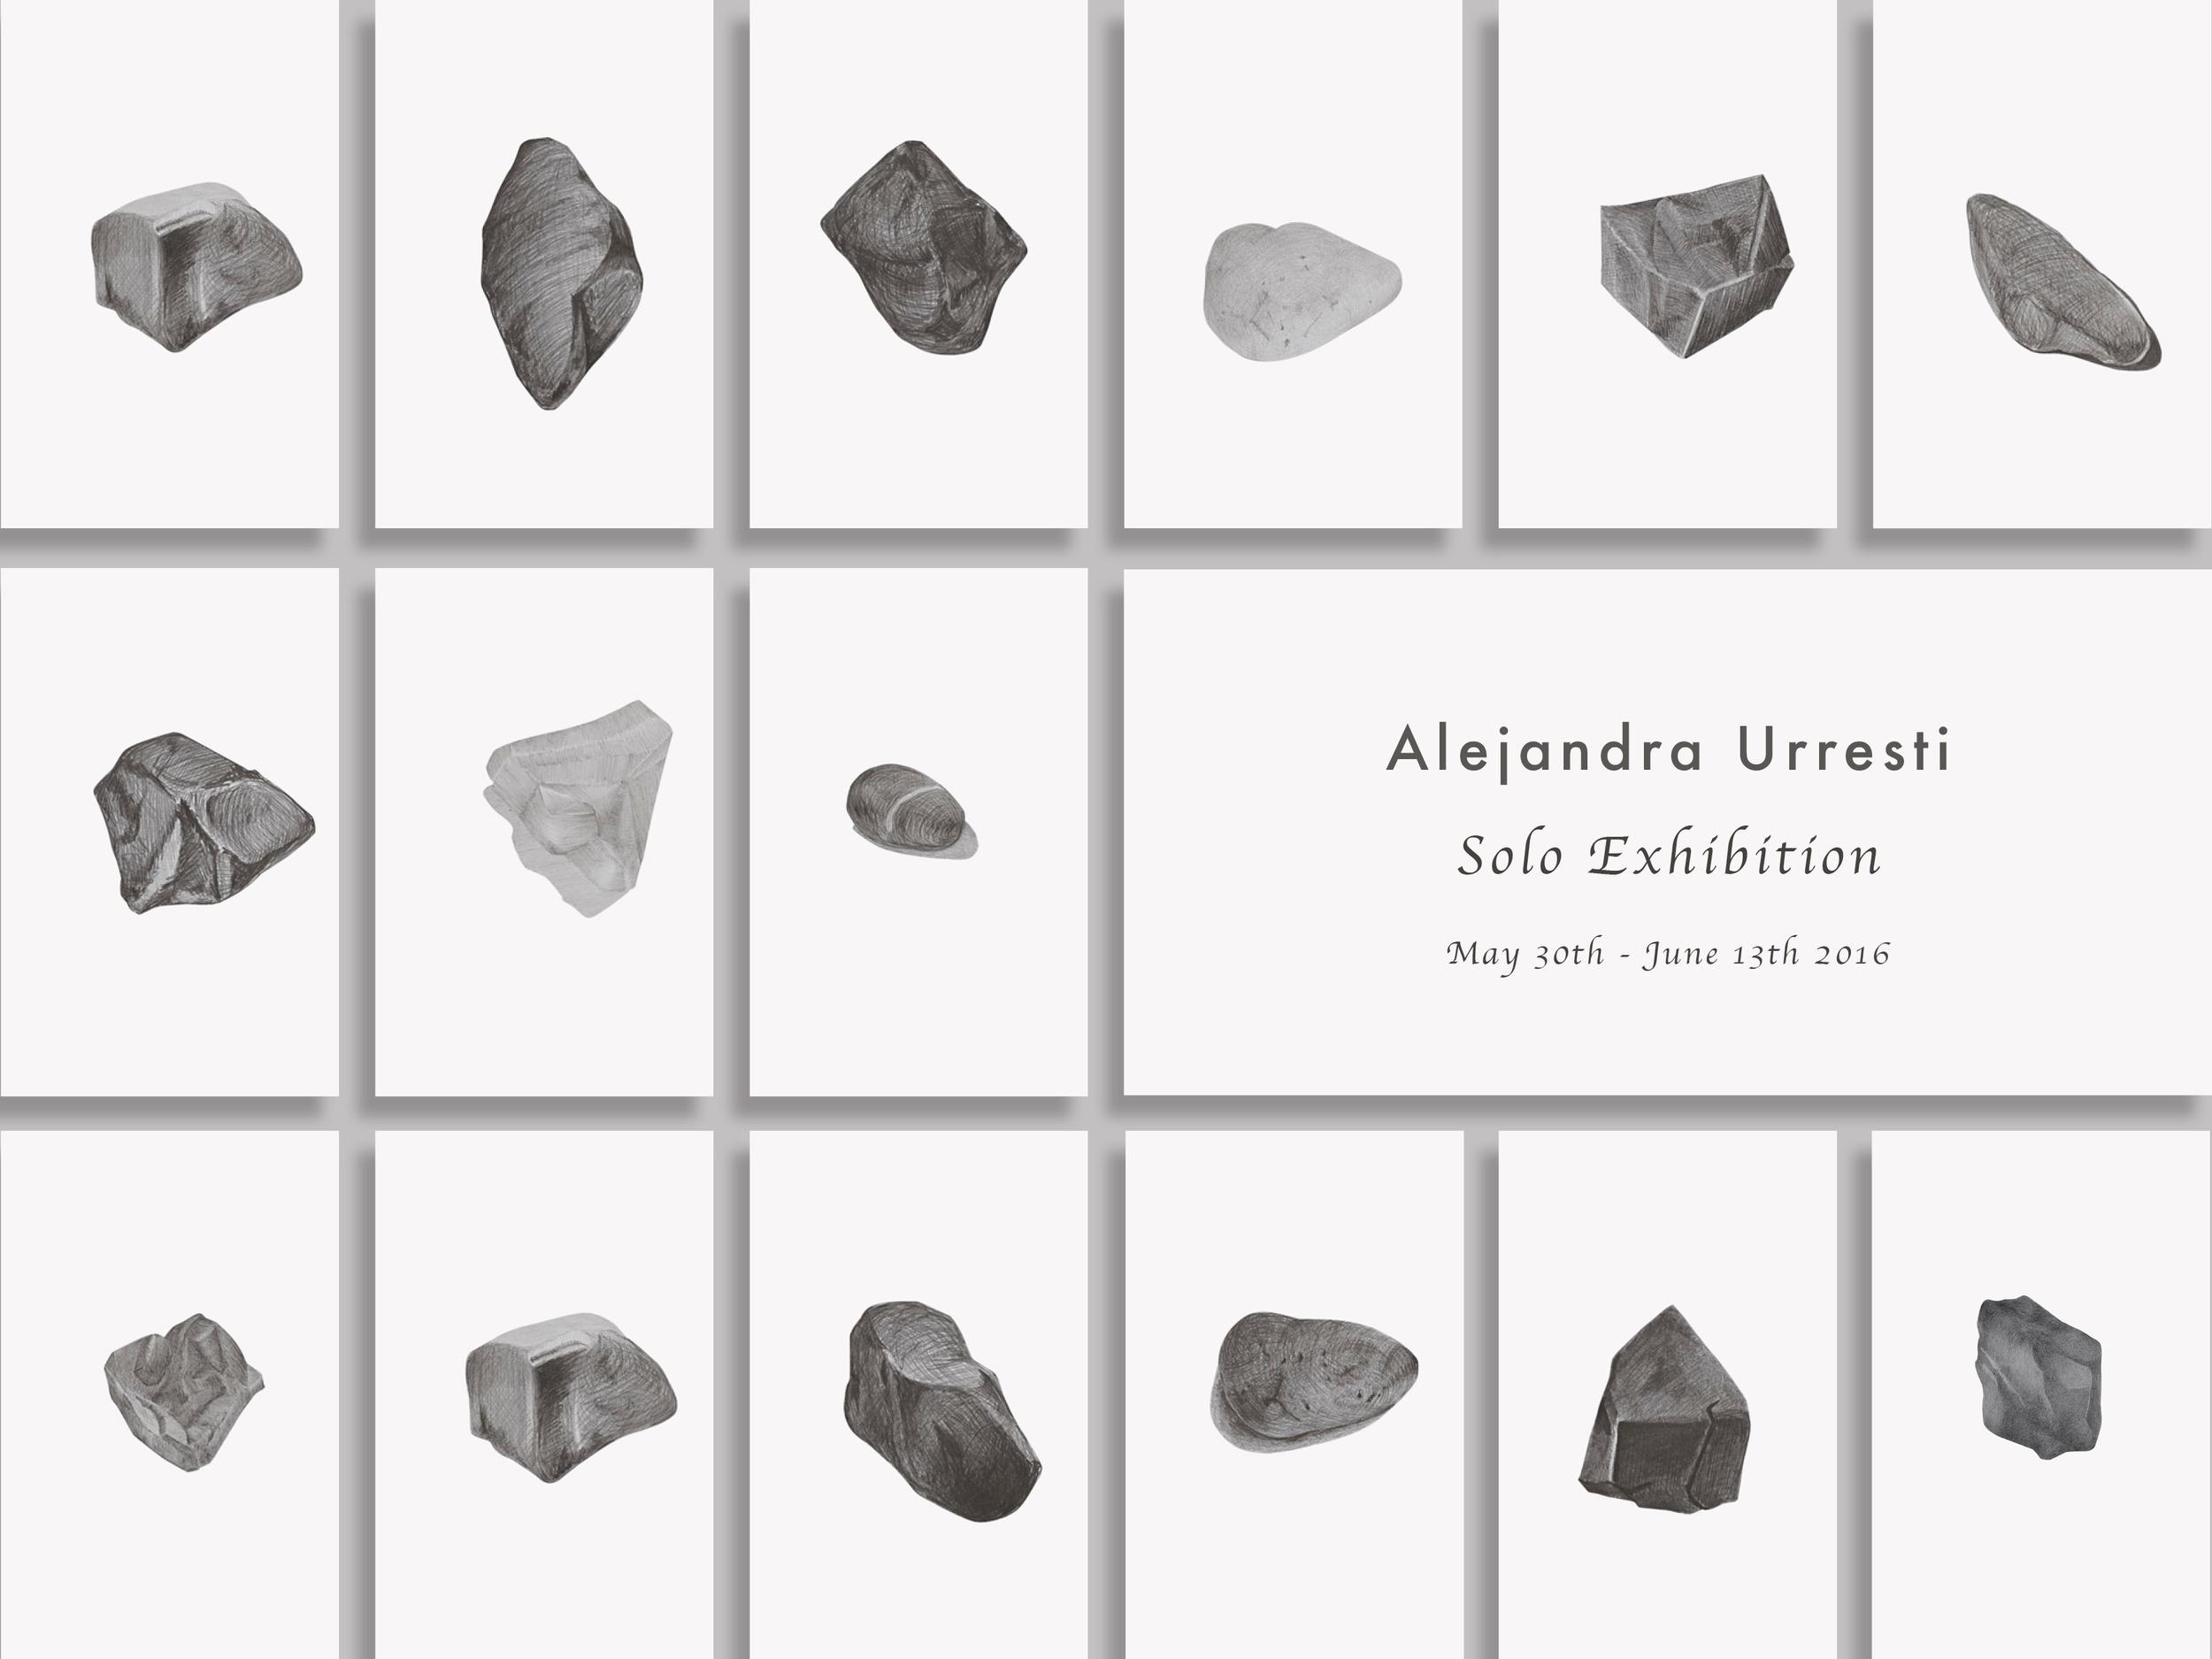 Alejandra Urresti